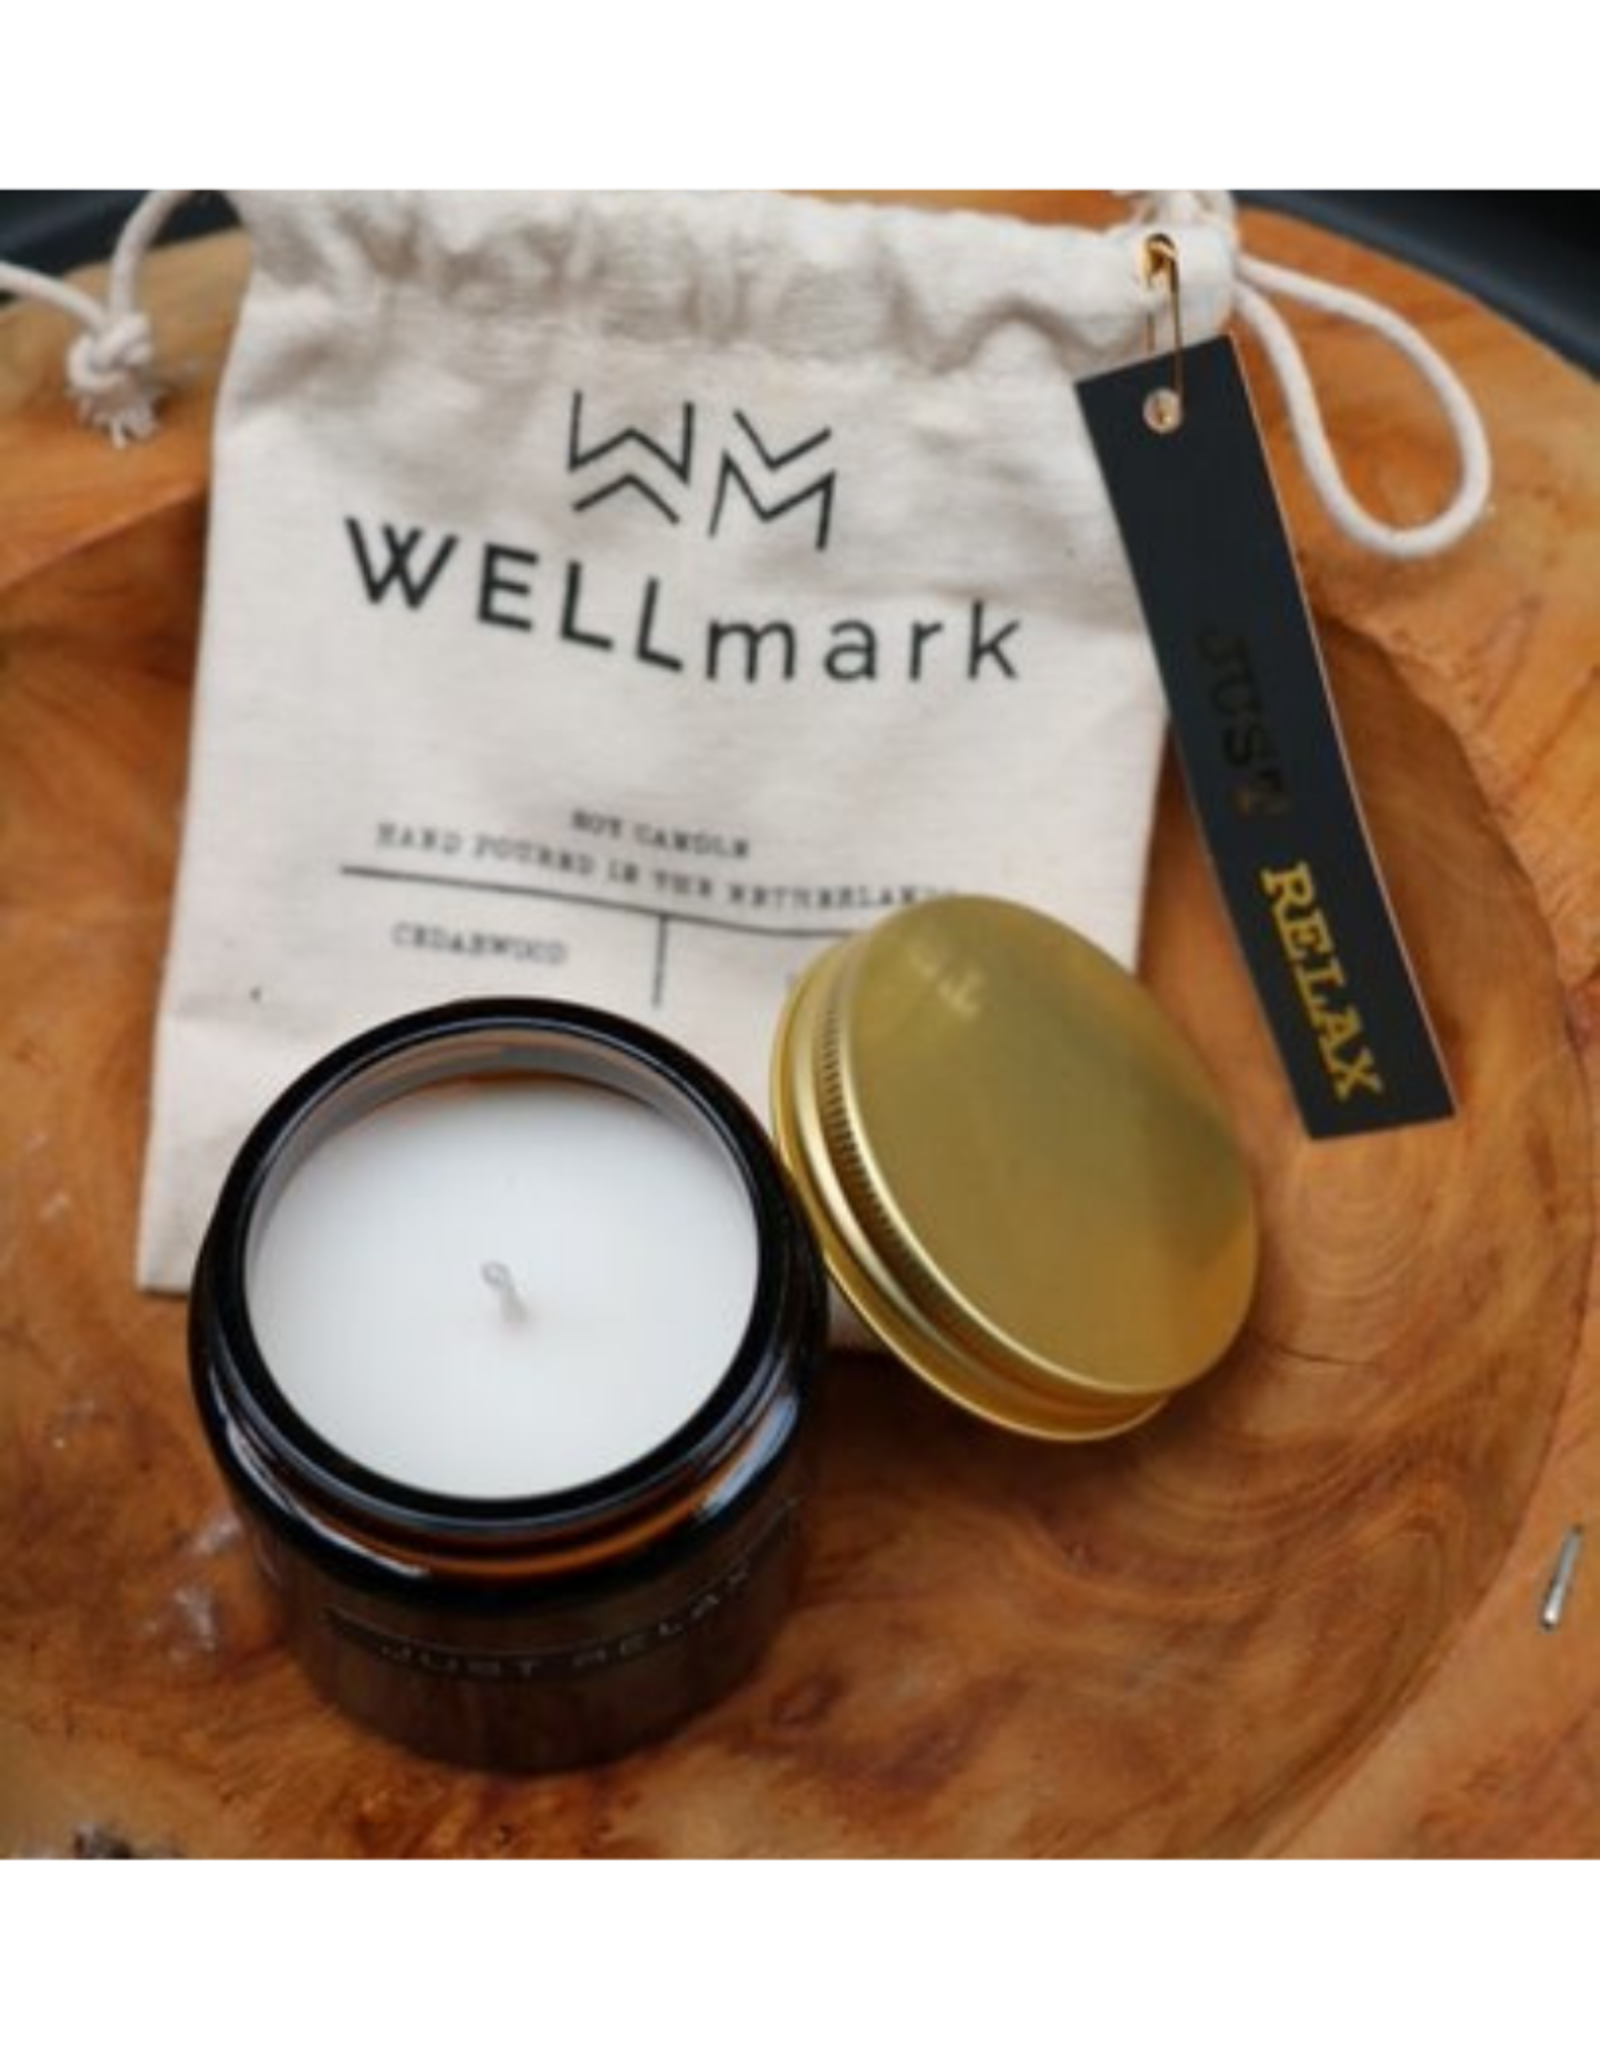 Wellmark Geurkaars Cedarwood (klein) - Let's Get Cosy